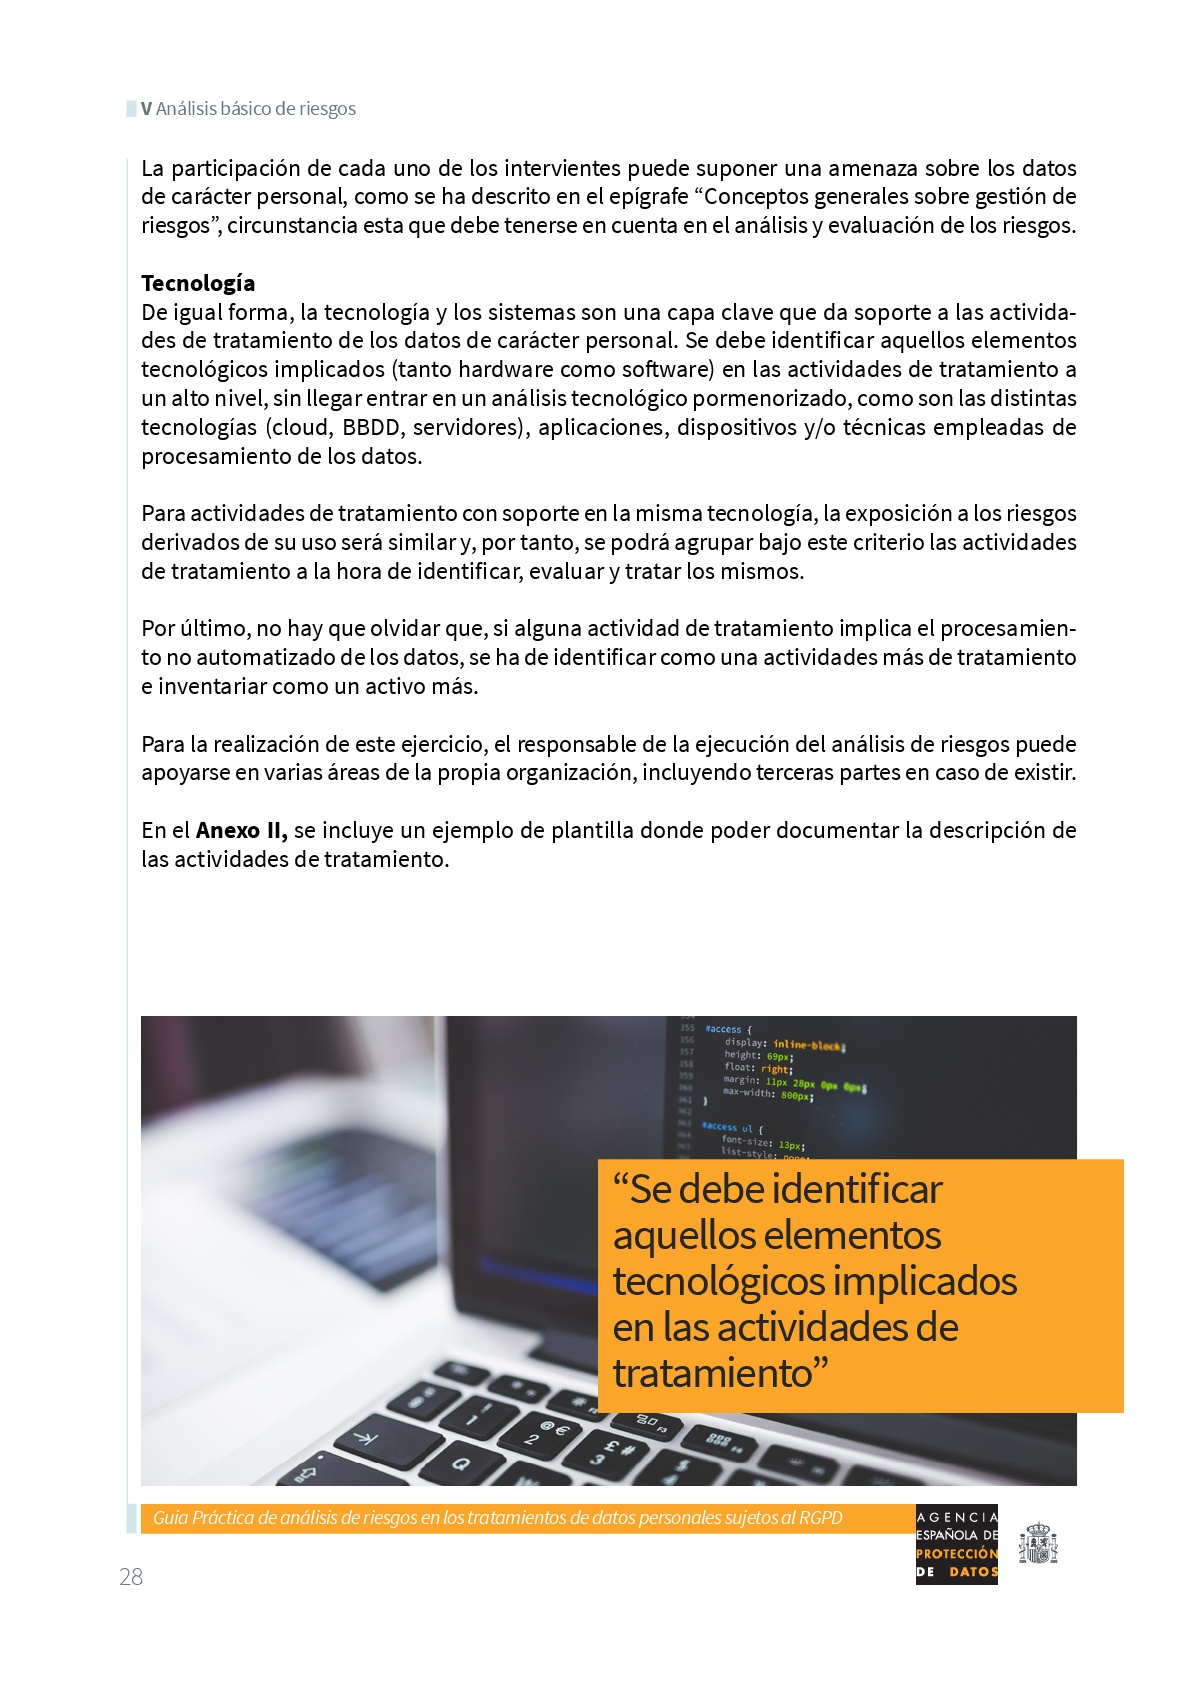 AnalisisDeRiesgosRGPD-029